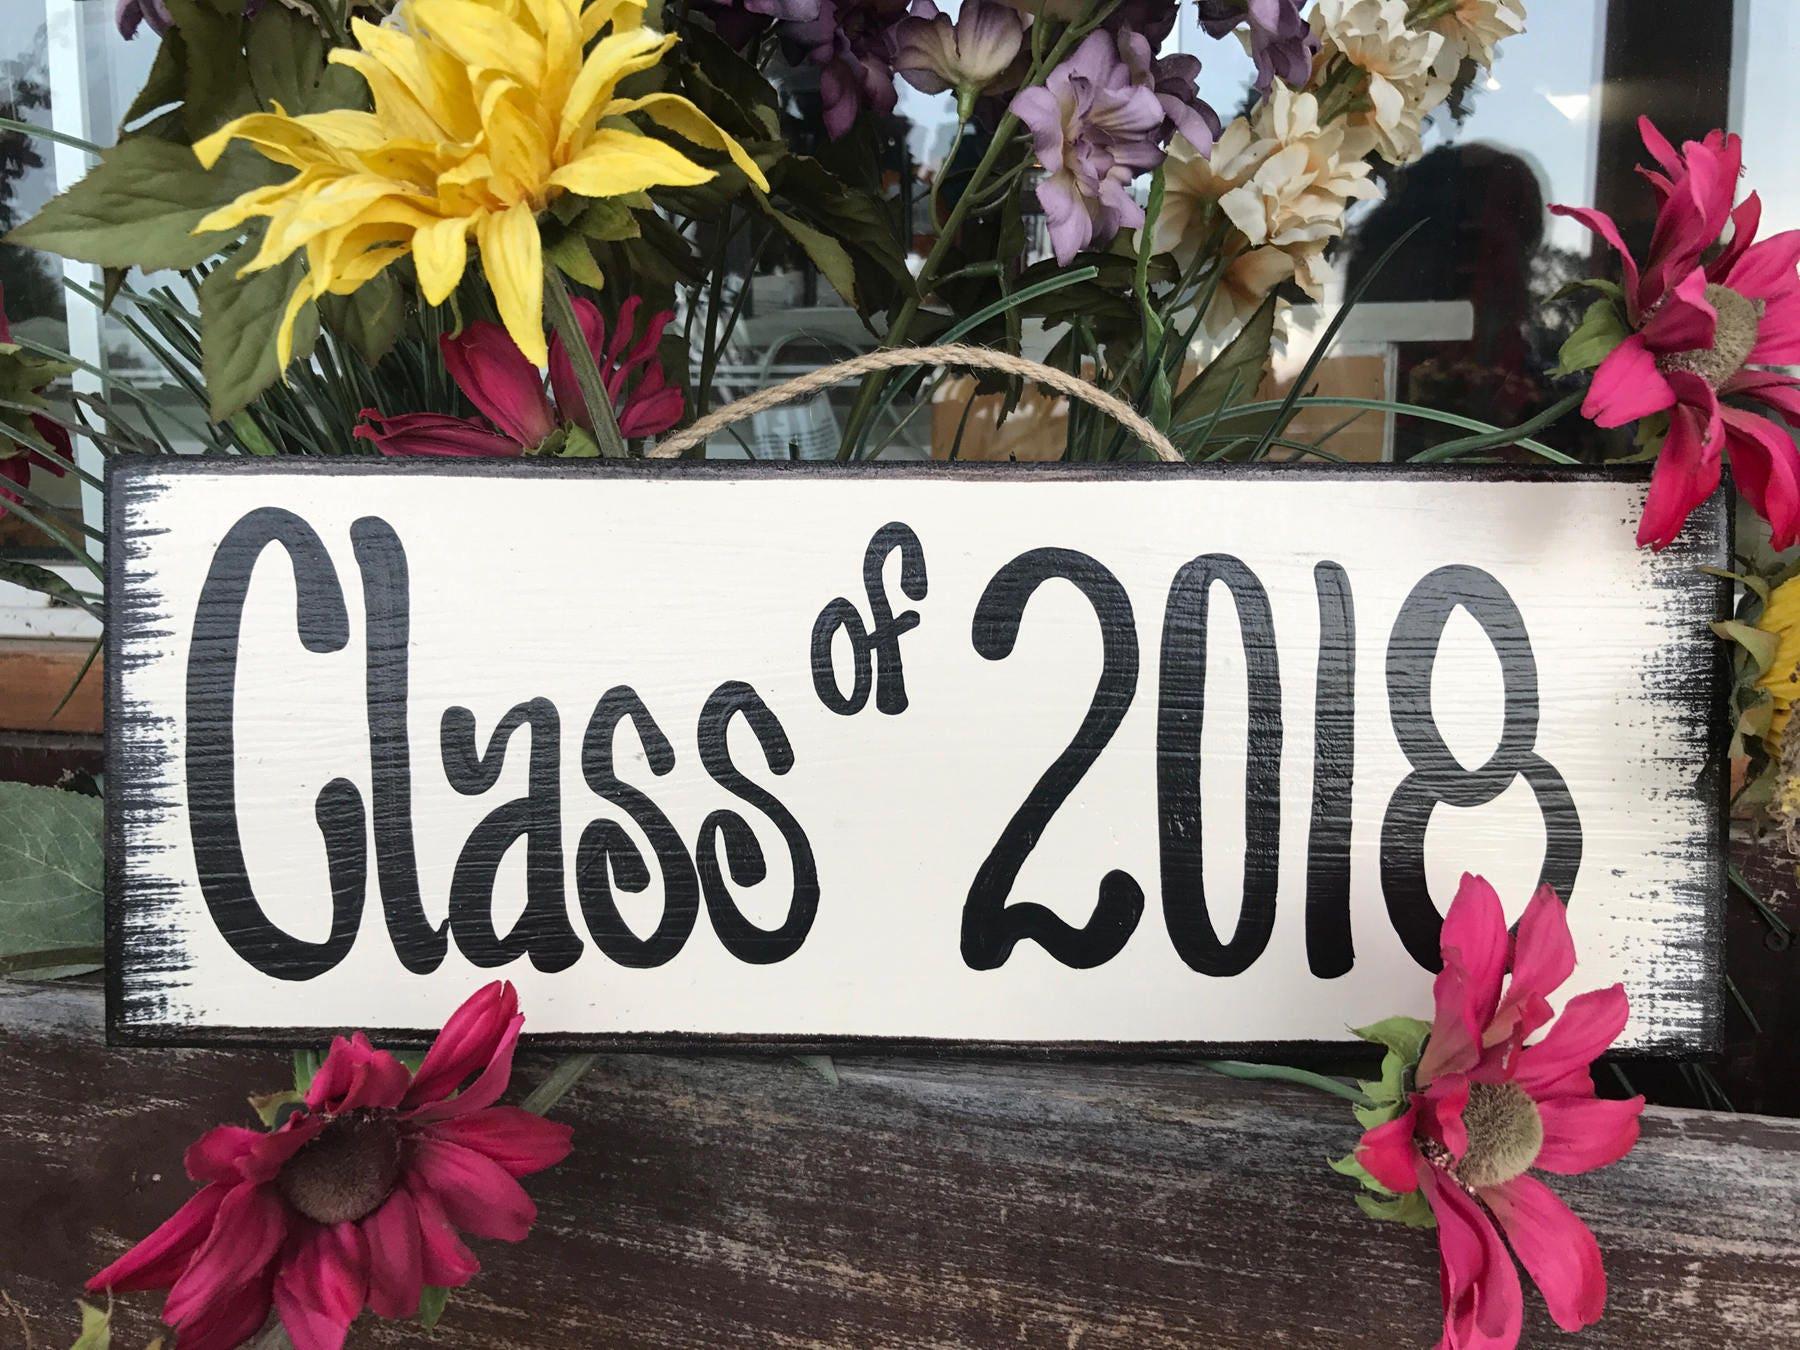 Graduation date for class of 2019 in Australia